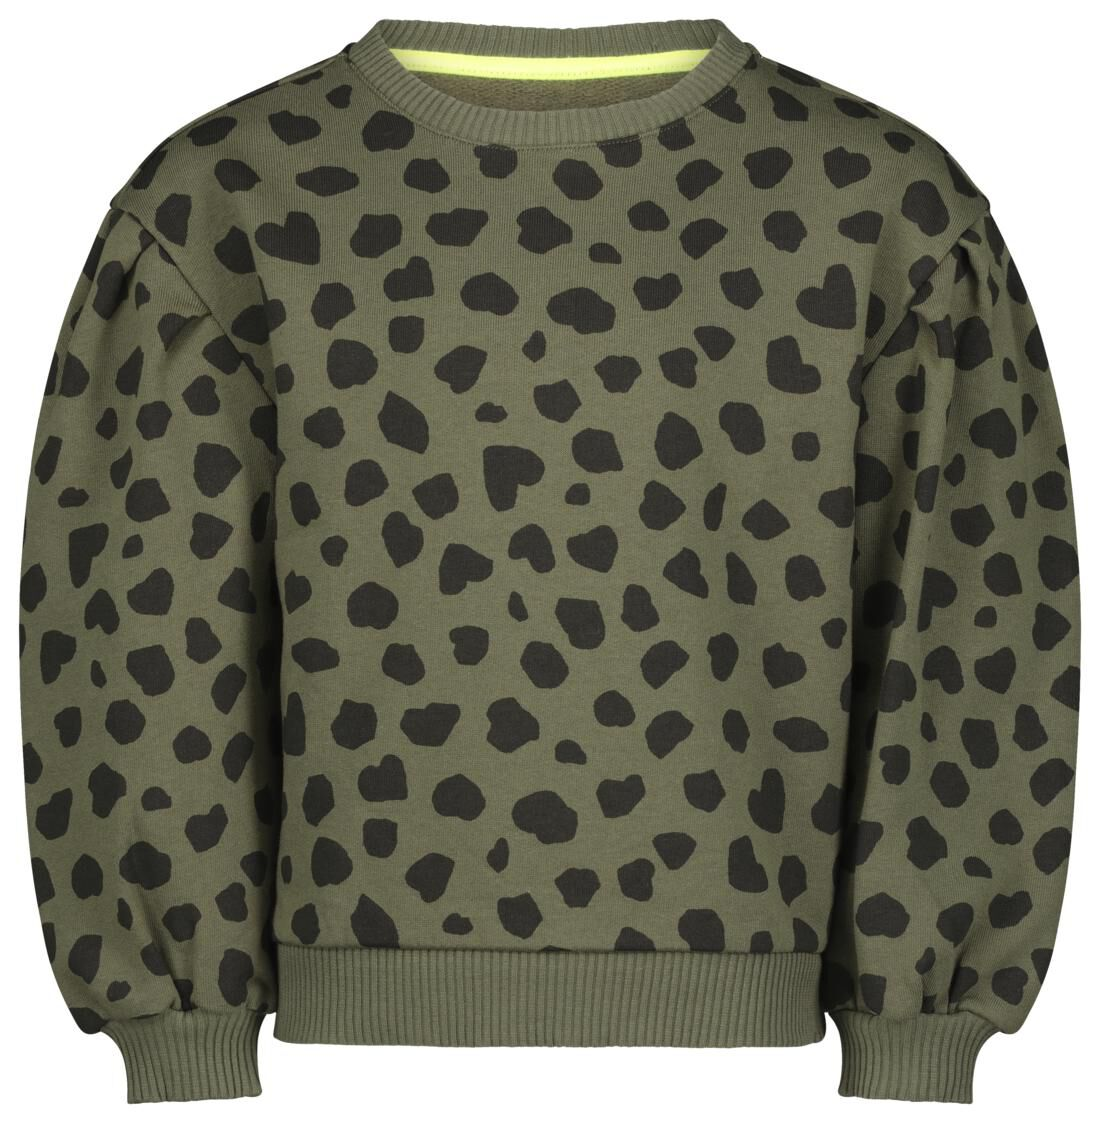 HEMA Kindersweater Ballonmouwen Legergroen (legergroen)